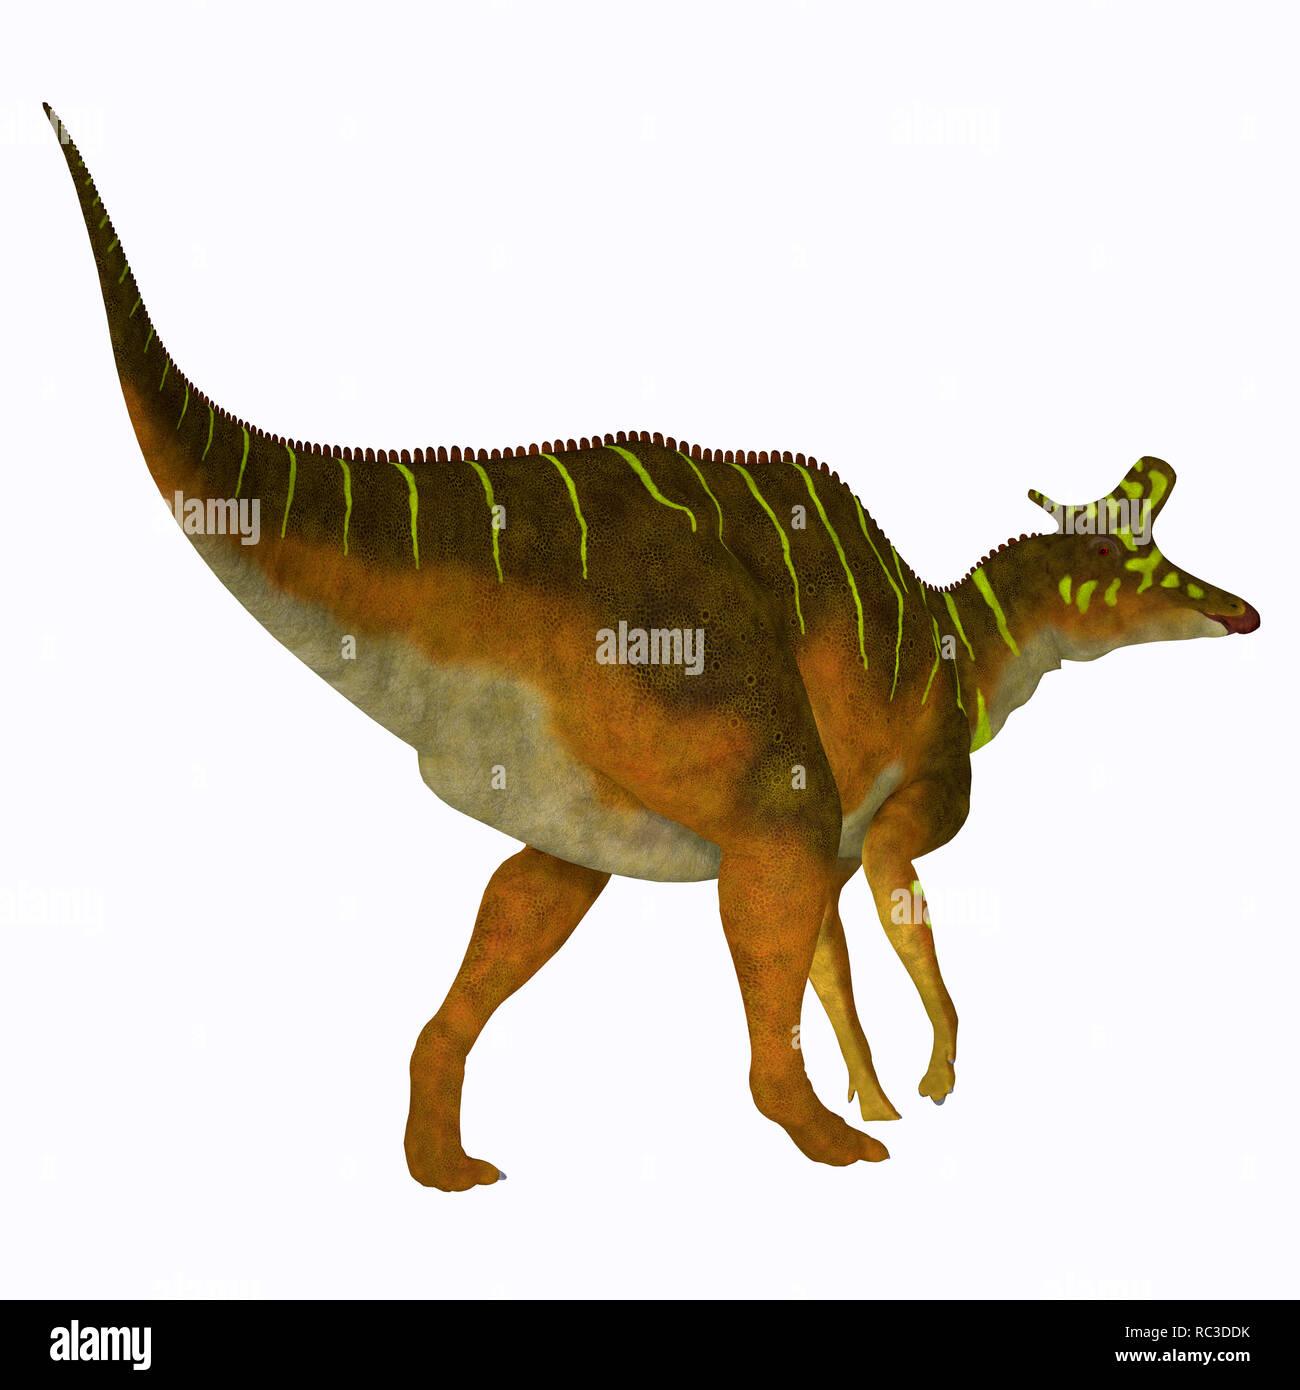 Lambeosaurus Dinosaur - Lambeosaurus was a herbivorous Hadrosaur dinosaur that lived in North America during the Cretaceous Period. - Stock Image